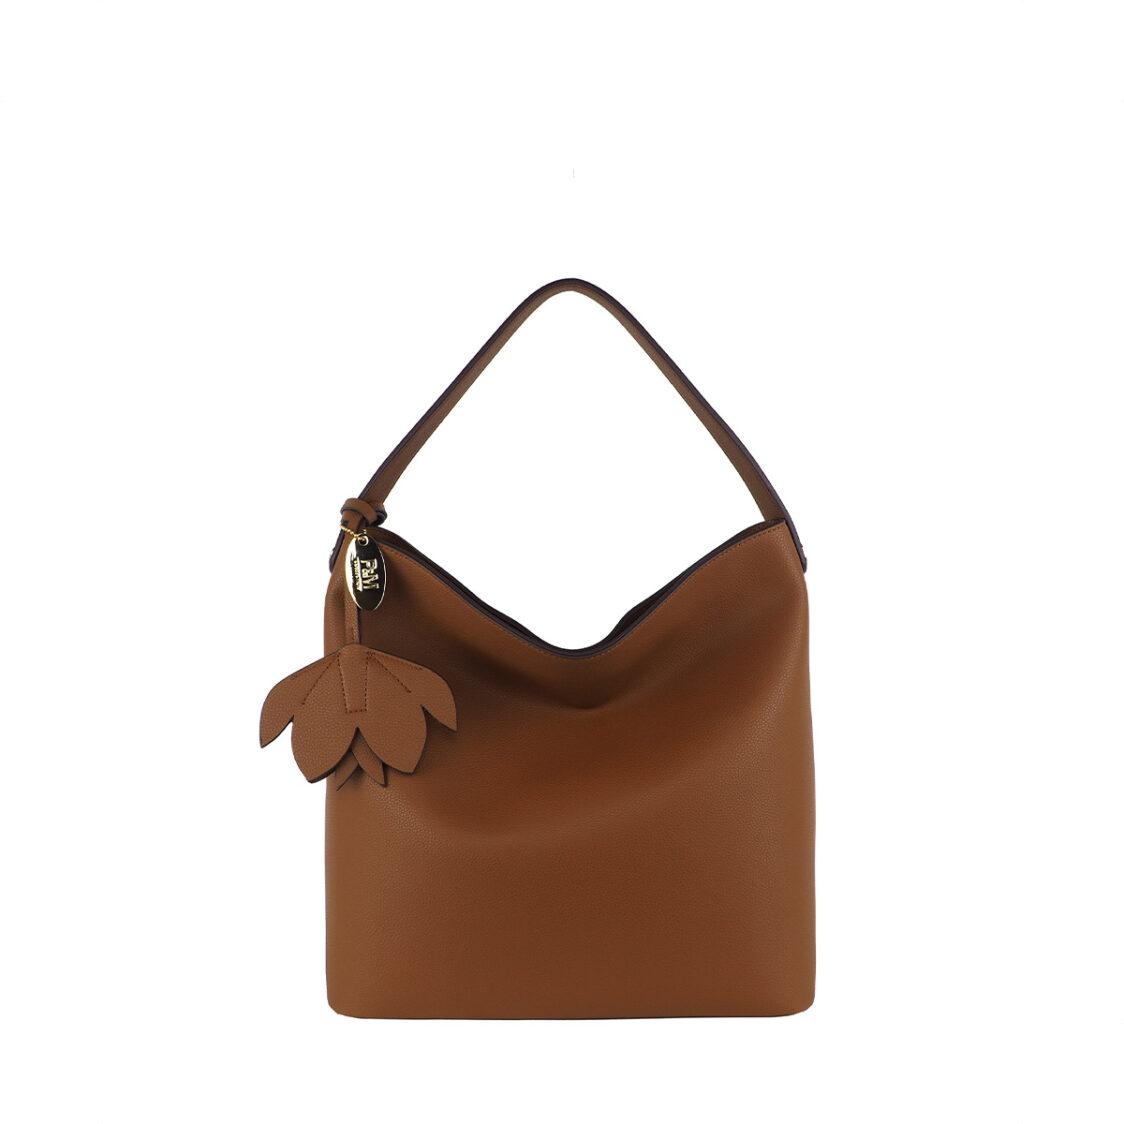 Perllini  Mel Single Handle Shoulder Bag Tan PY9923-Tan